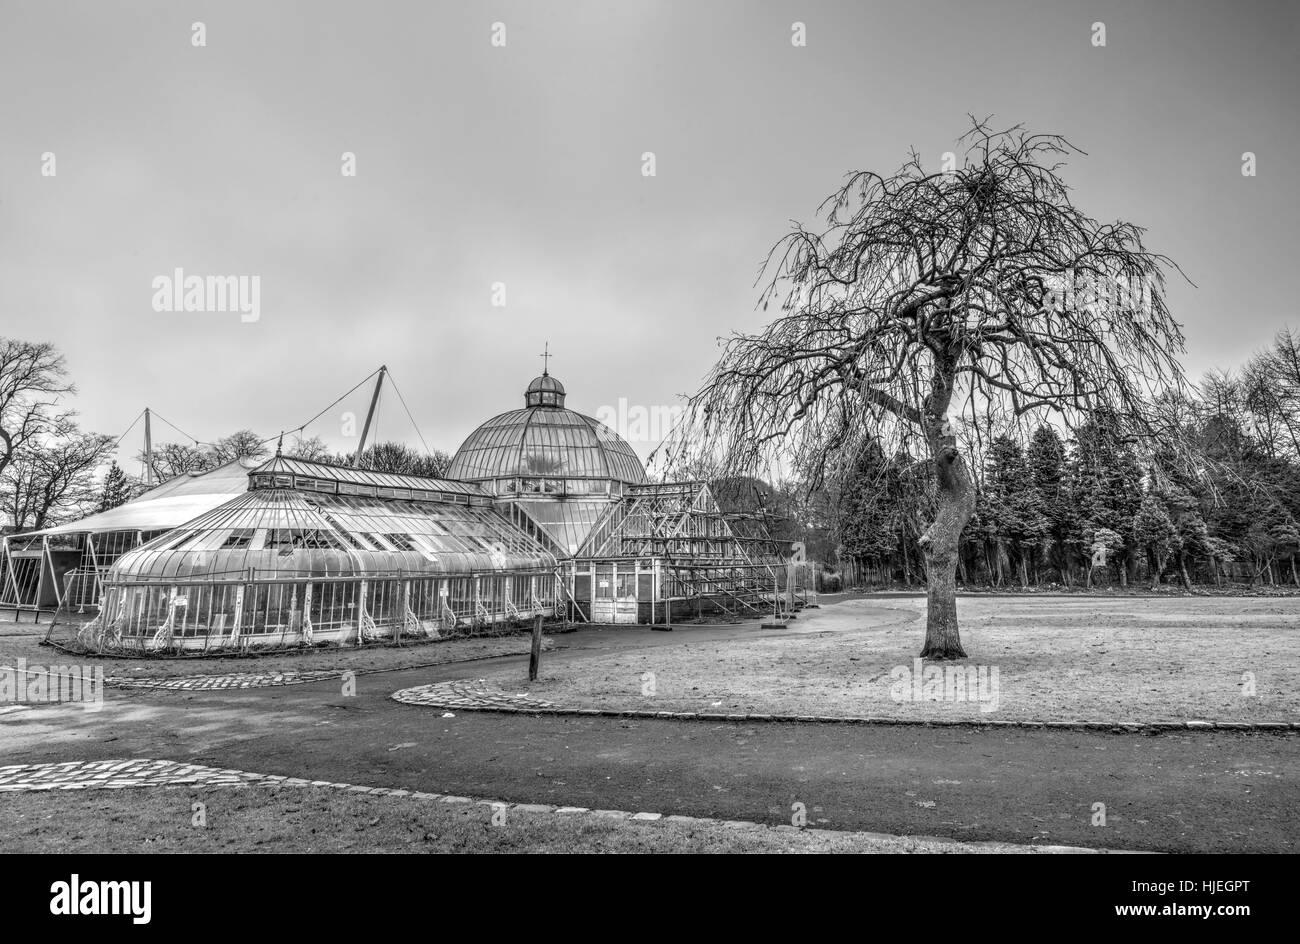 The Winter Gardens at Tollcross Park Glasgow - Stock Image